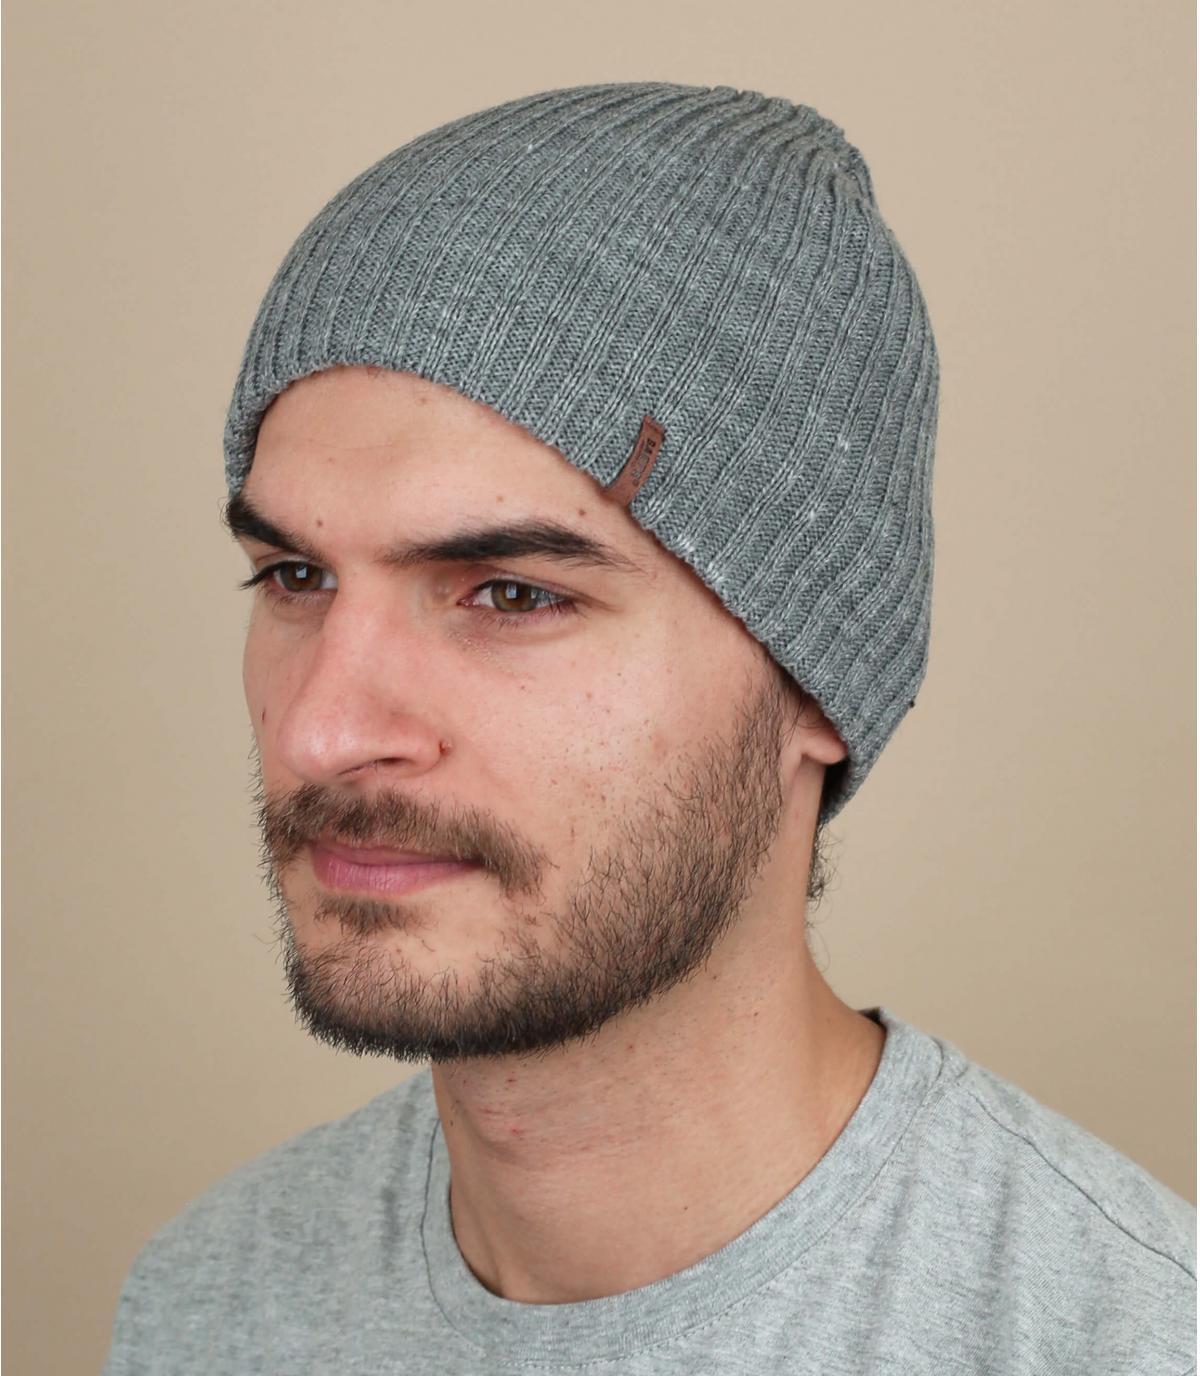 Barts graue Herrenmütze